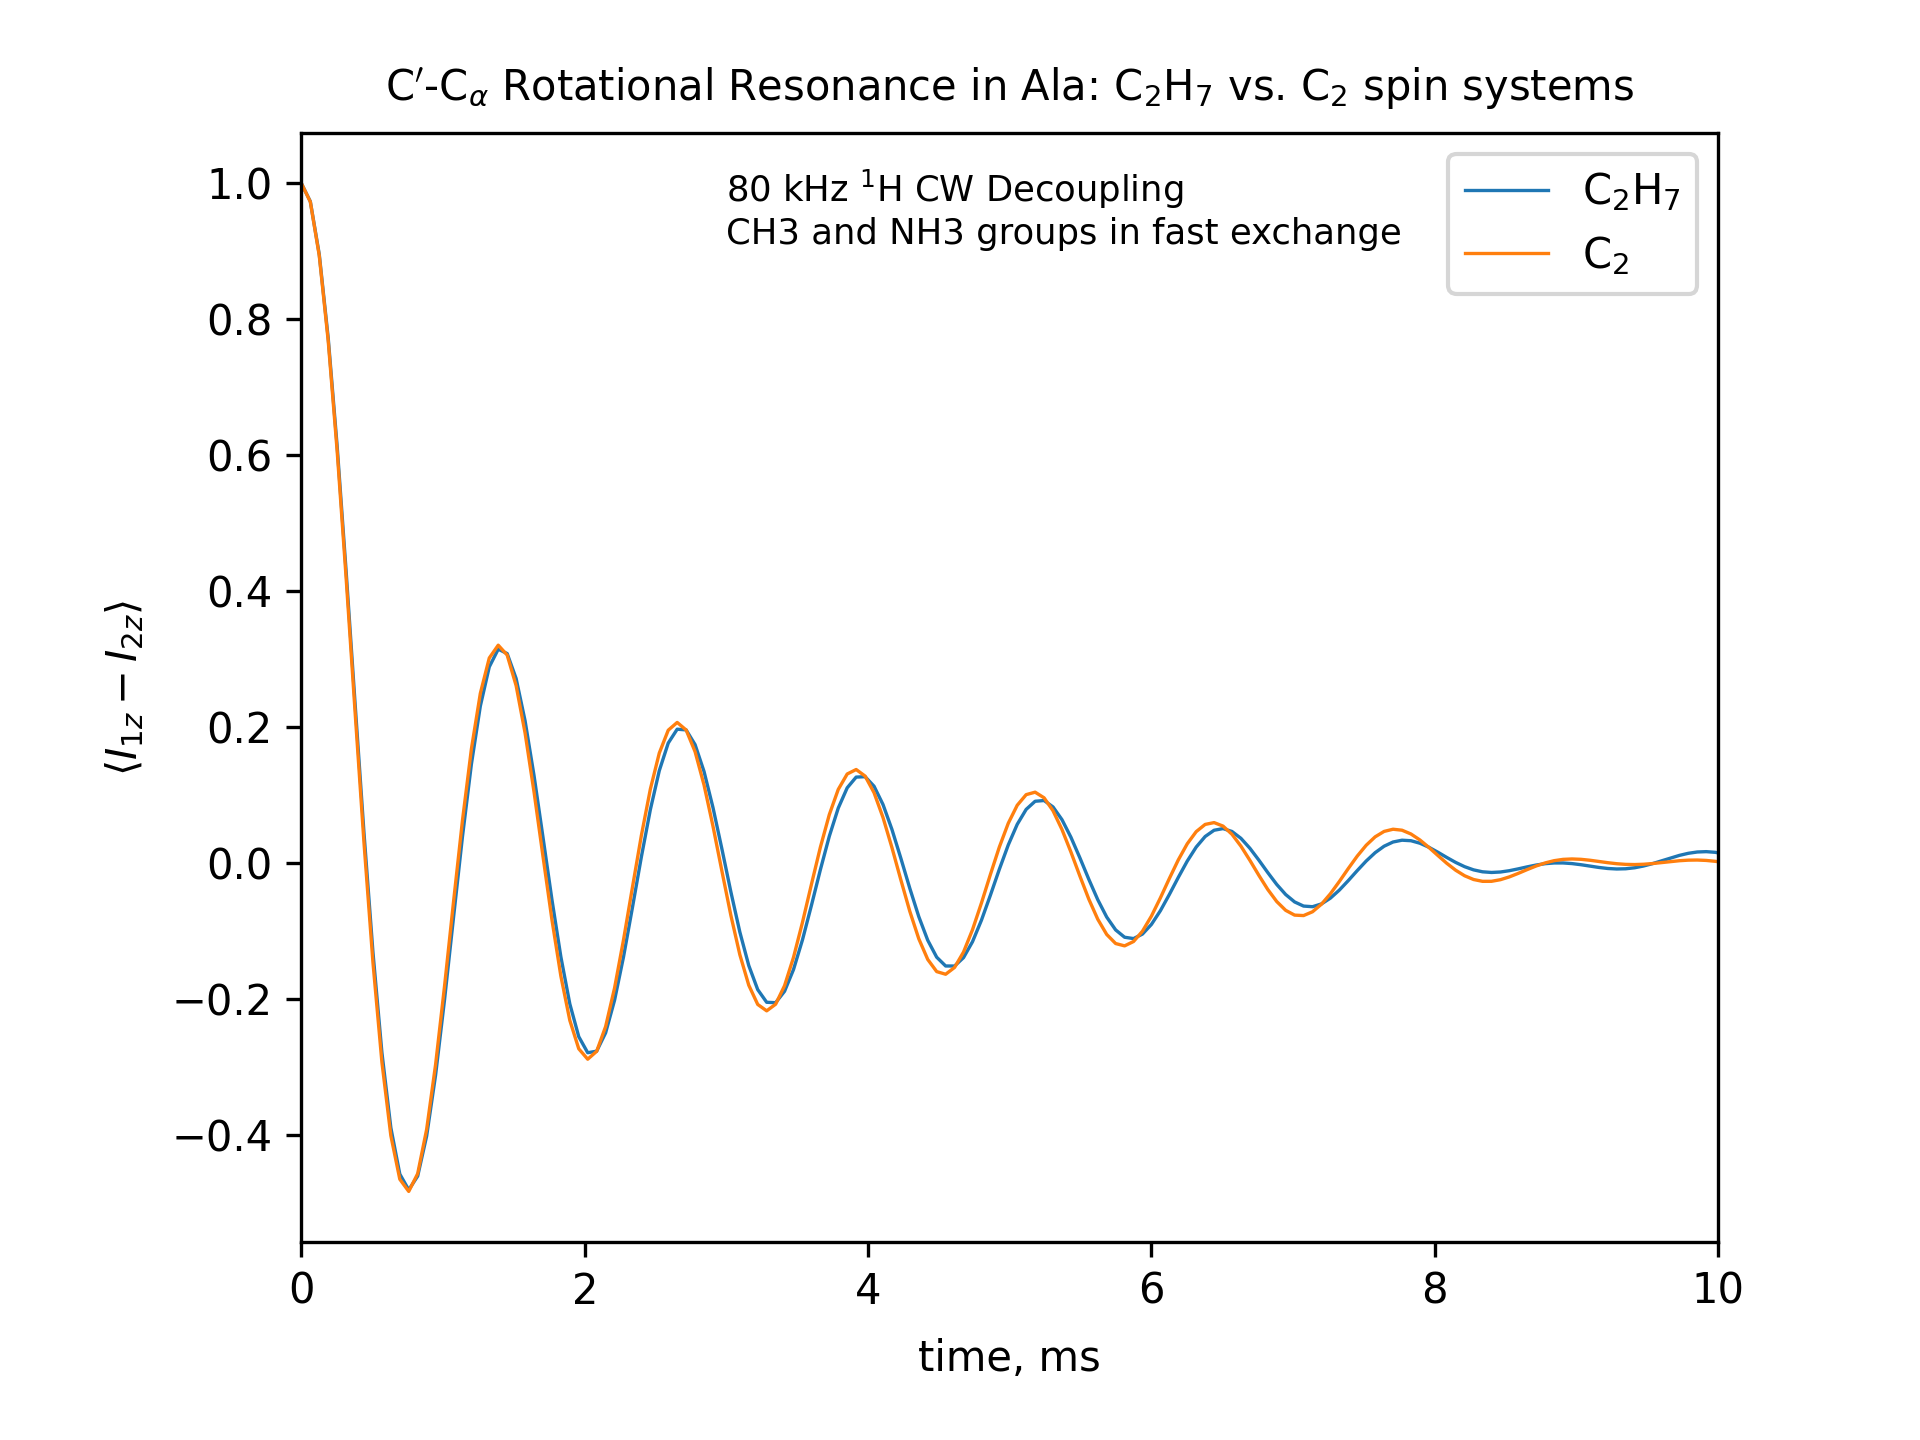 R2 Exchange Curve